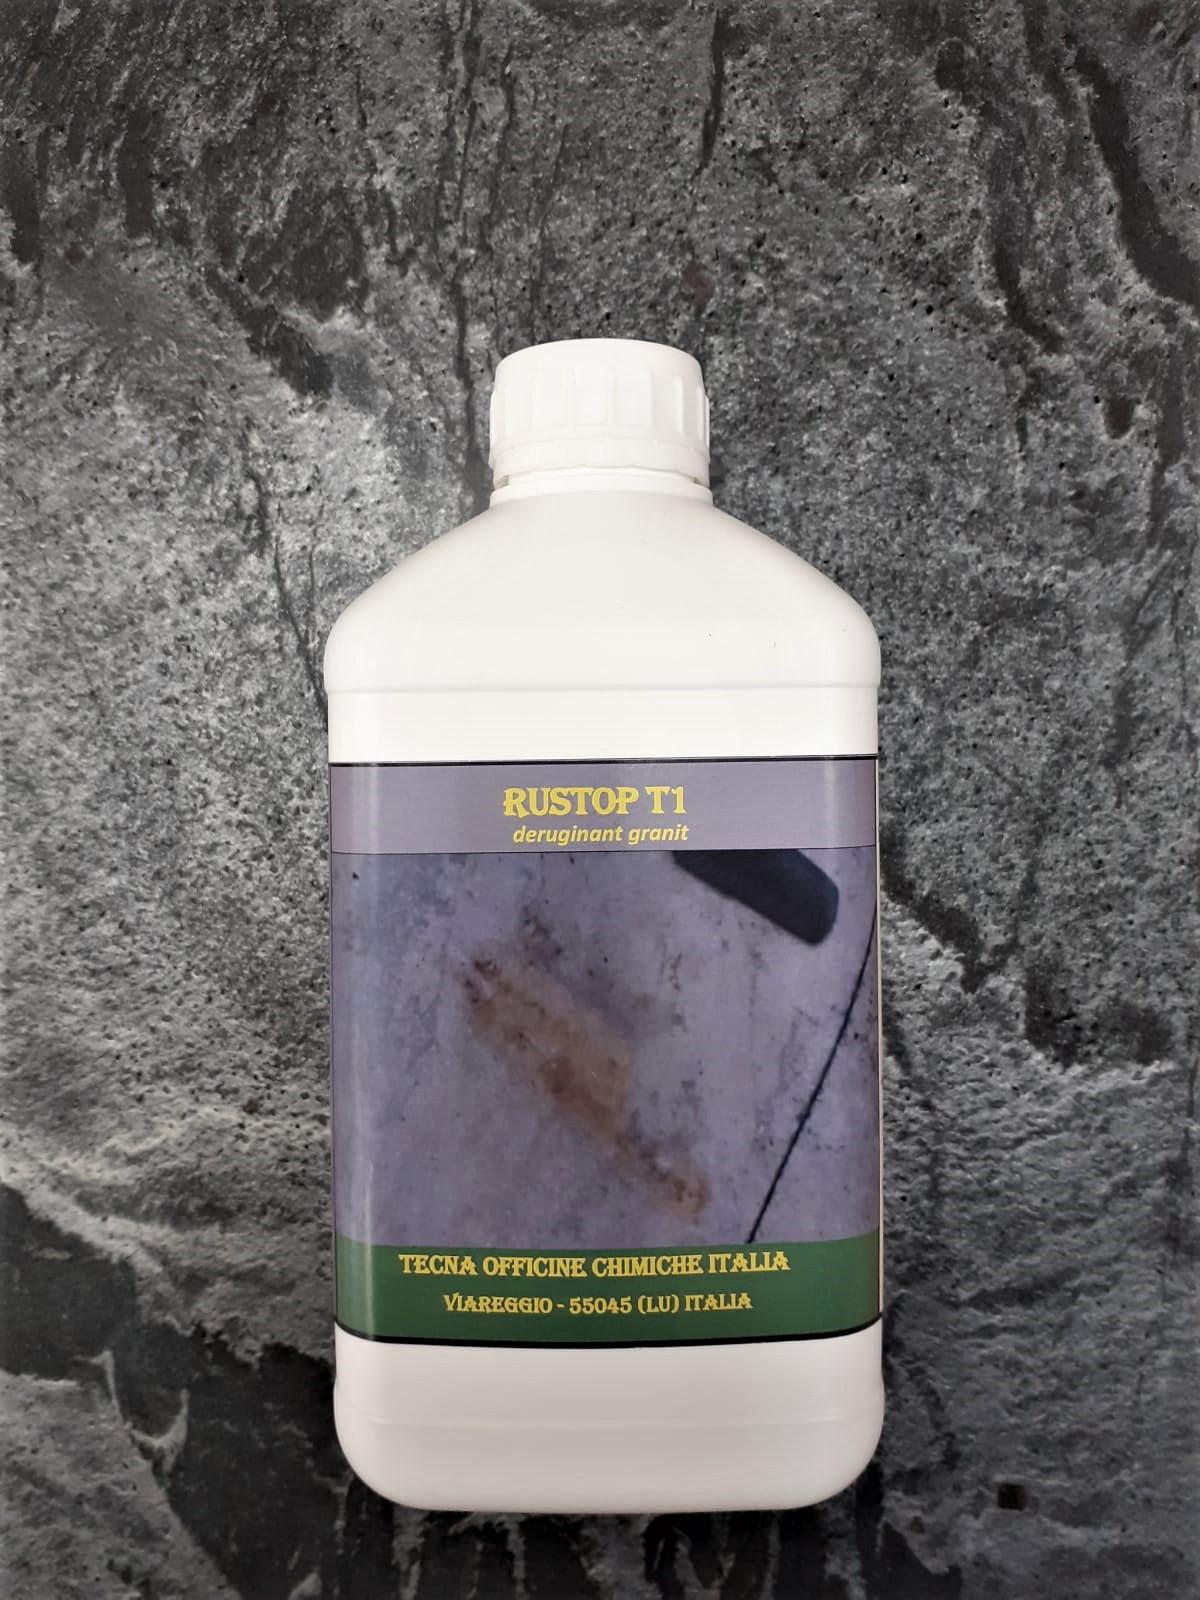 solutie-eliminare-rugina-rustop-t1-1